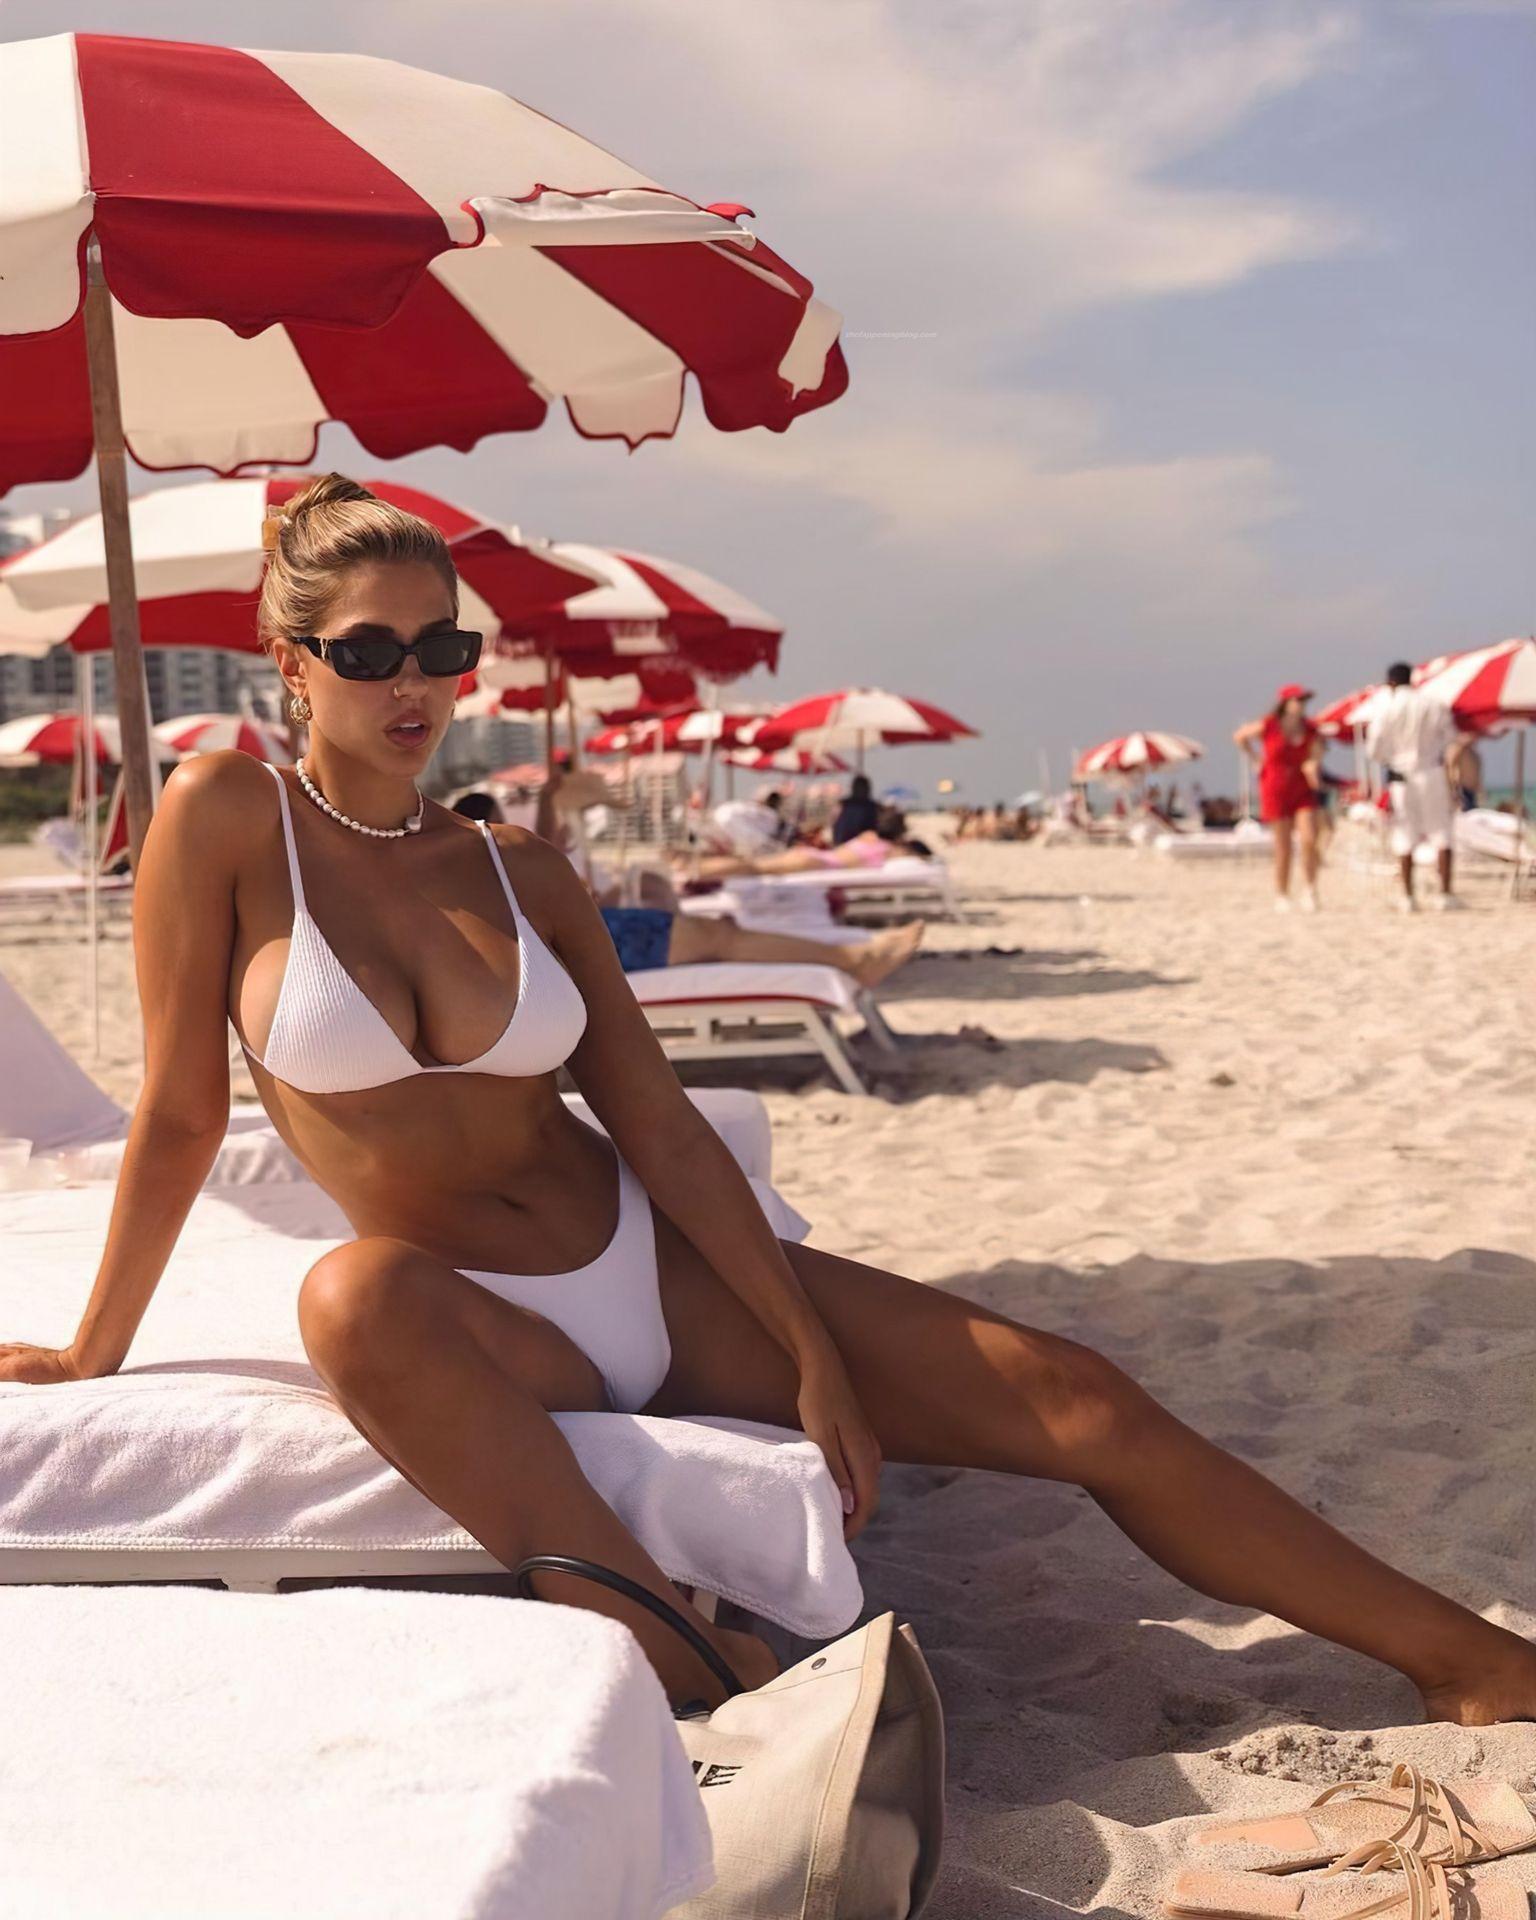 Kara-Del-Toro-Boobs-in-Bikini-1-thefappeningblog.com_.jpg